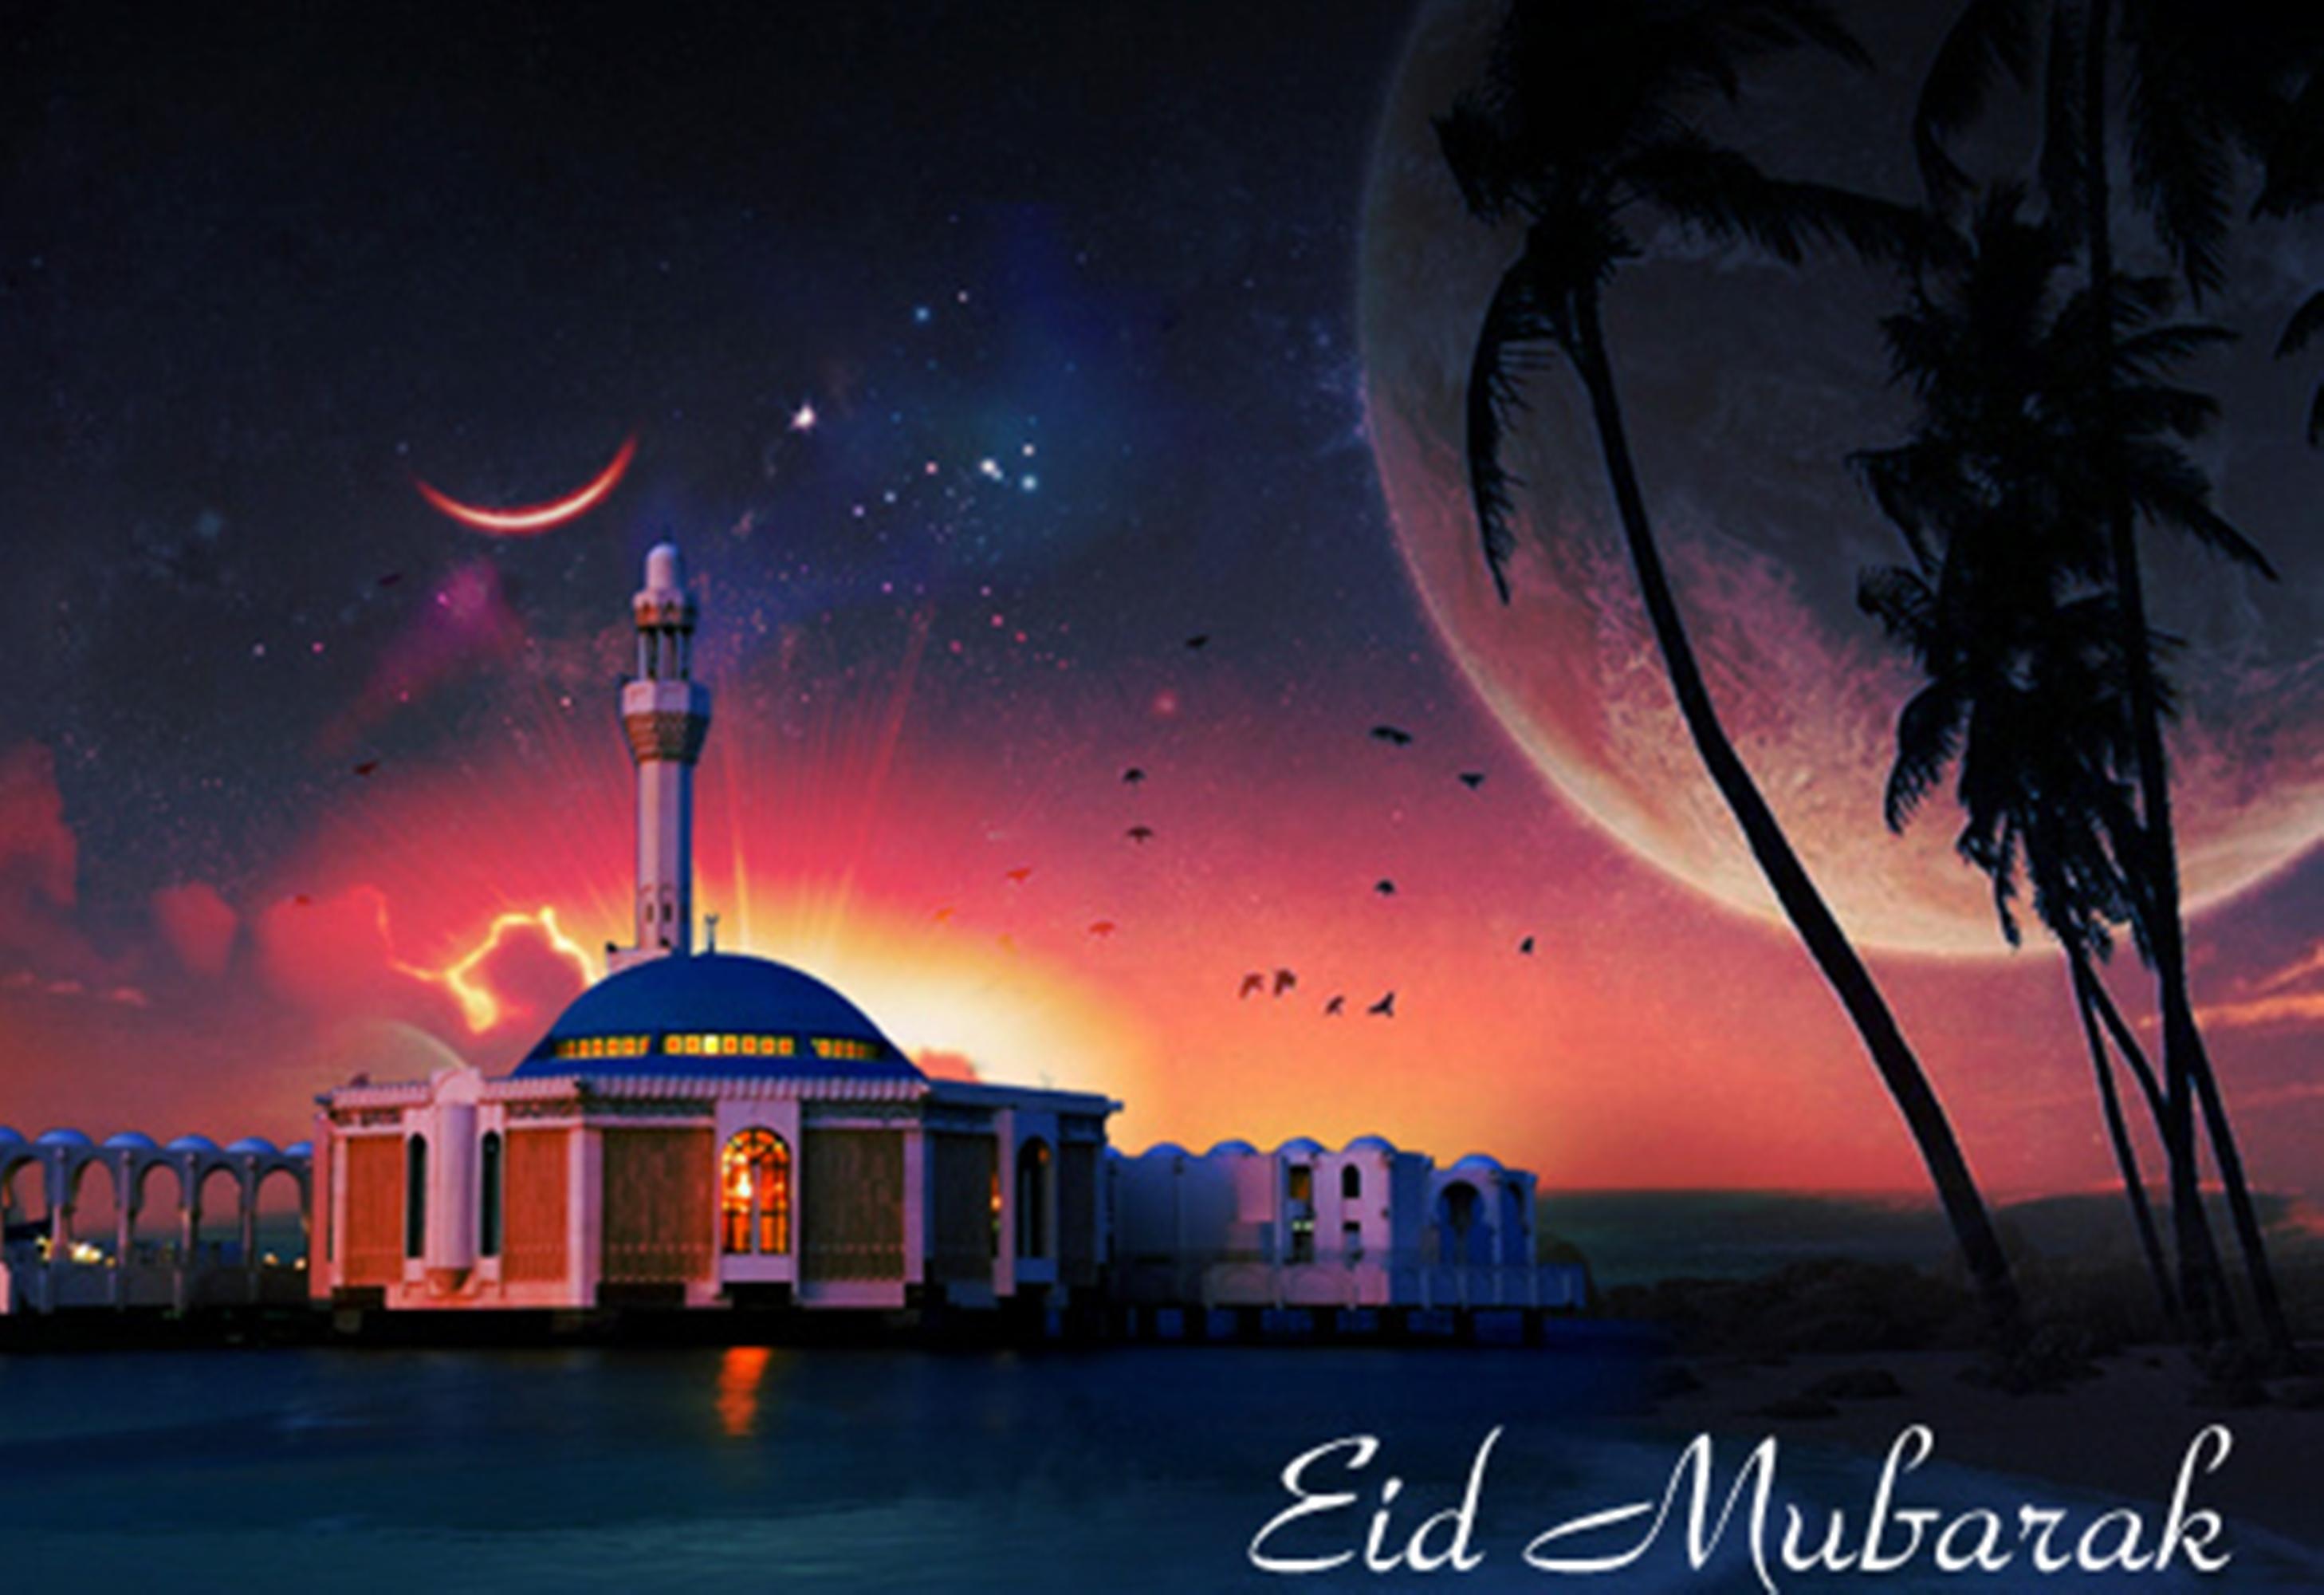 eid mubarak wishes funny videos